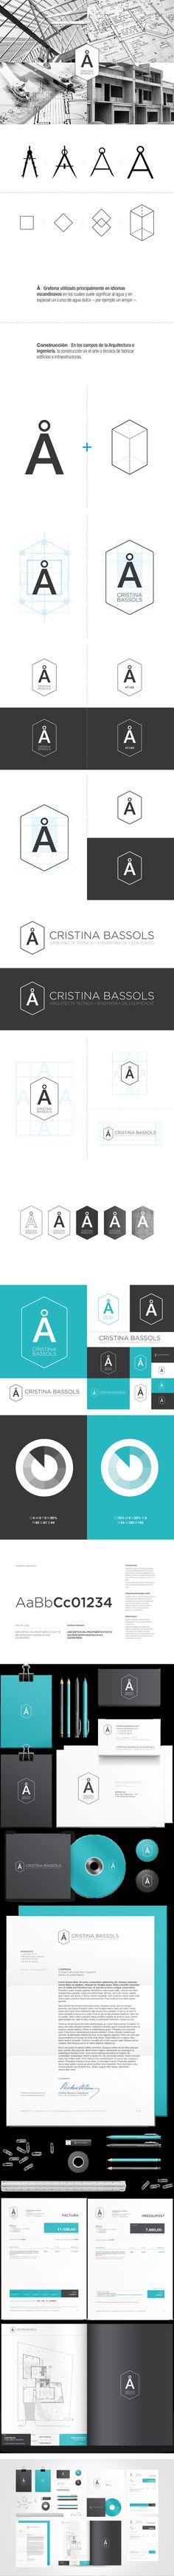 Cristina Bassols visual Identity #branding